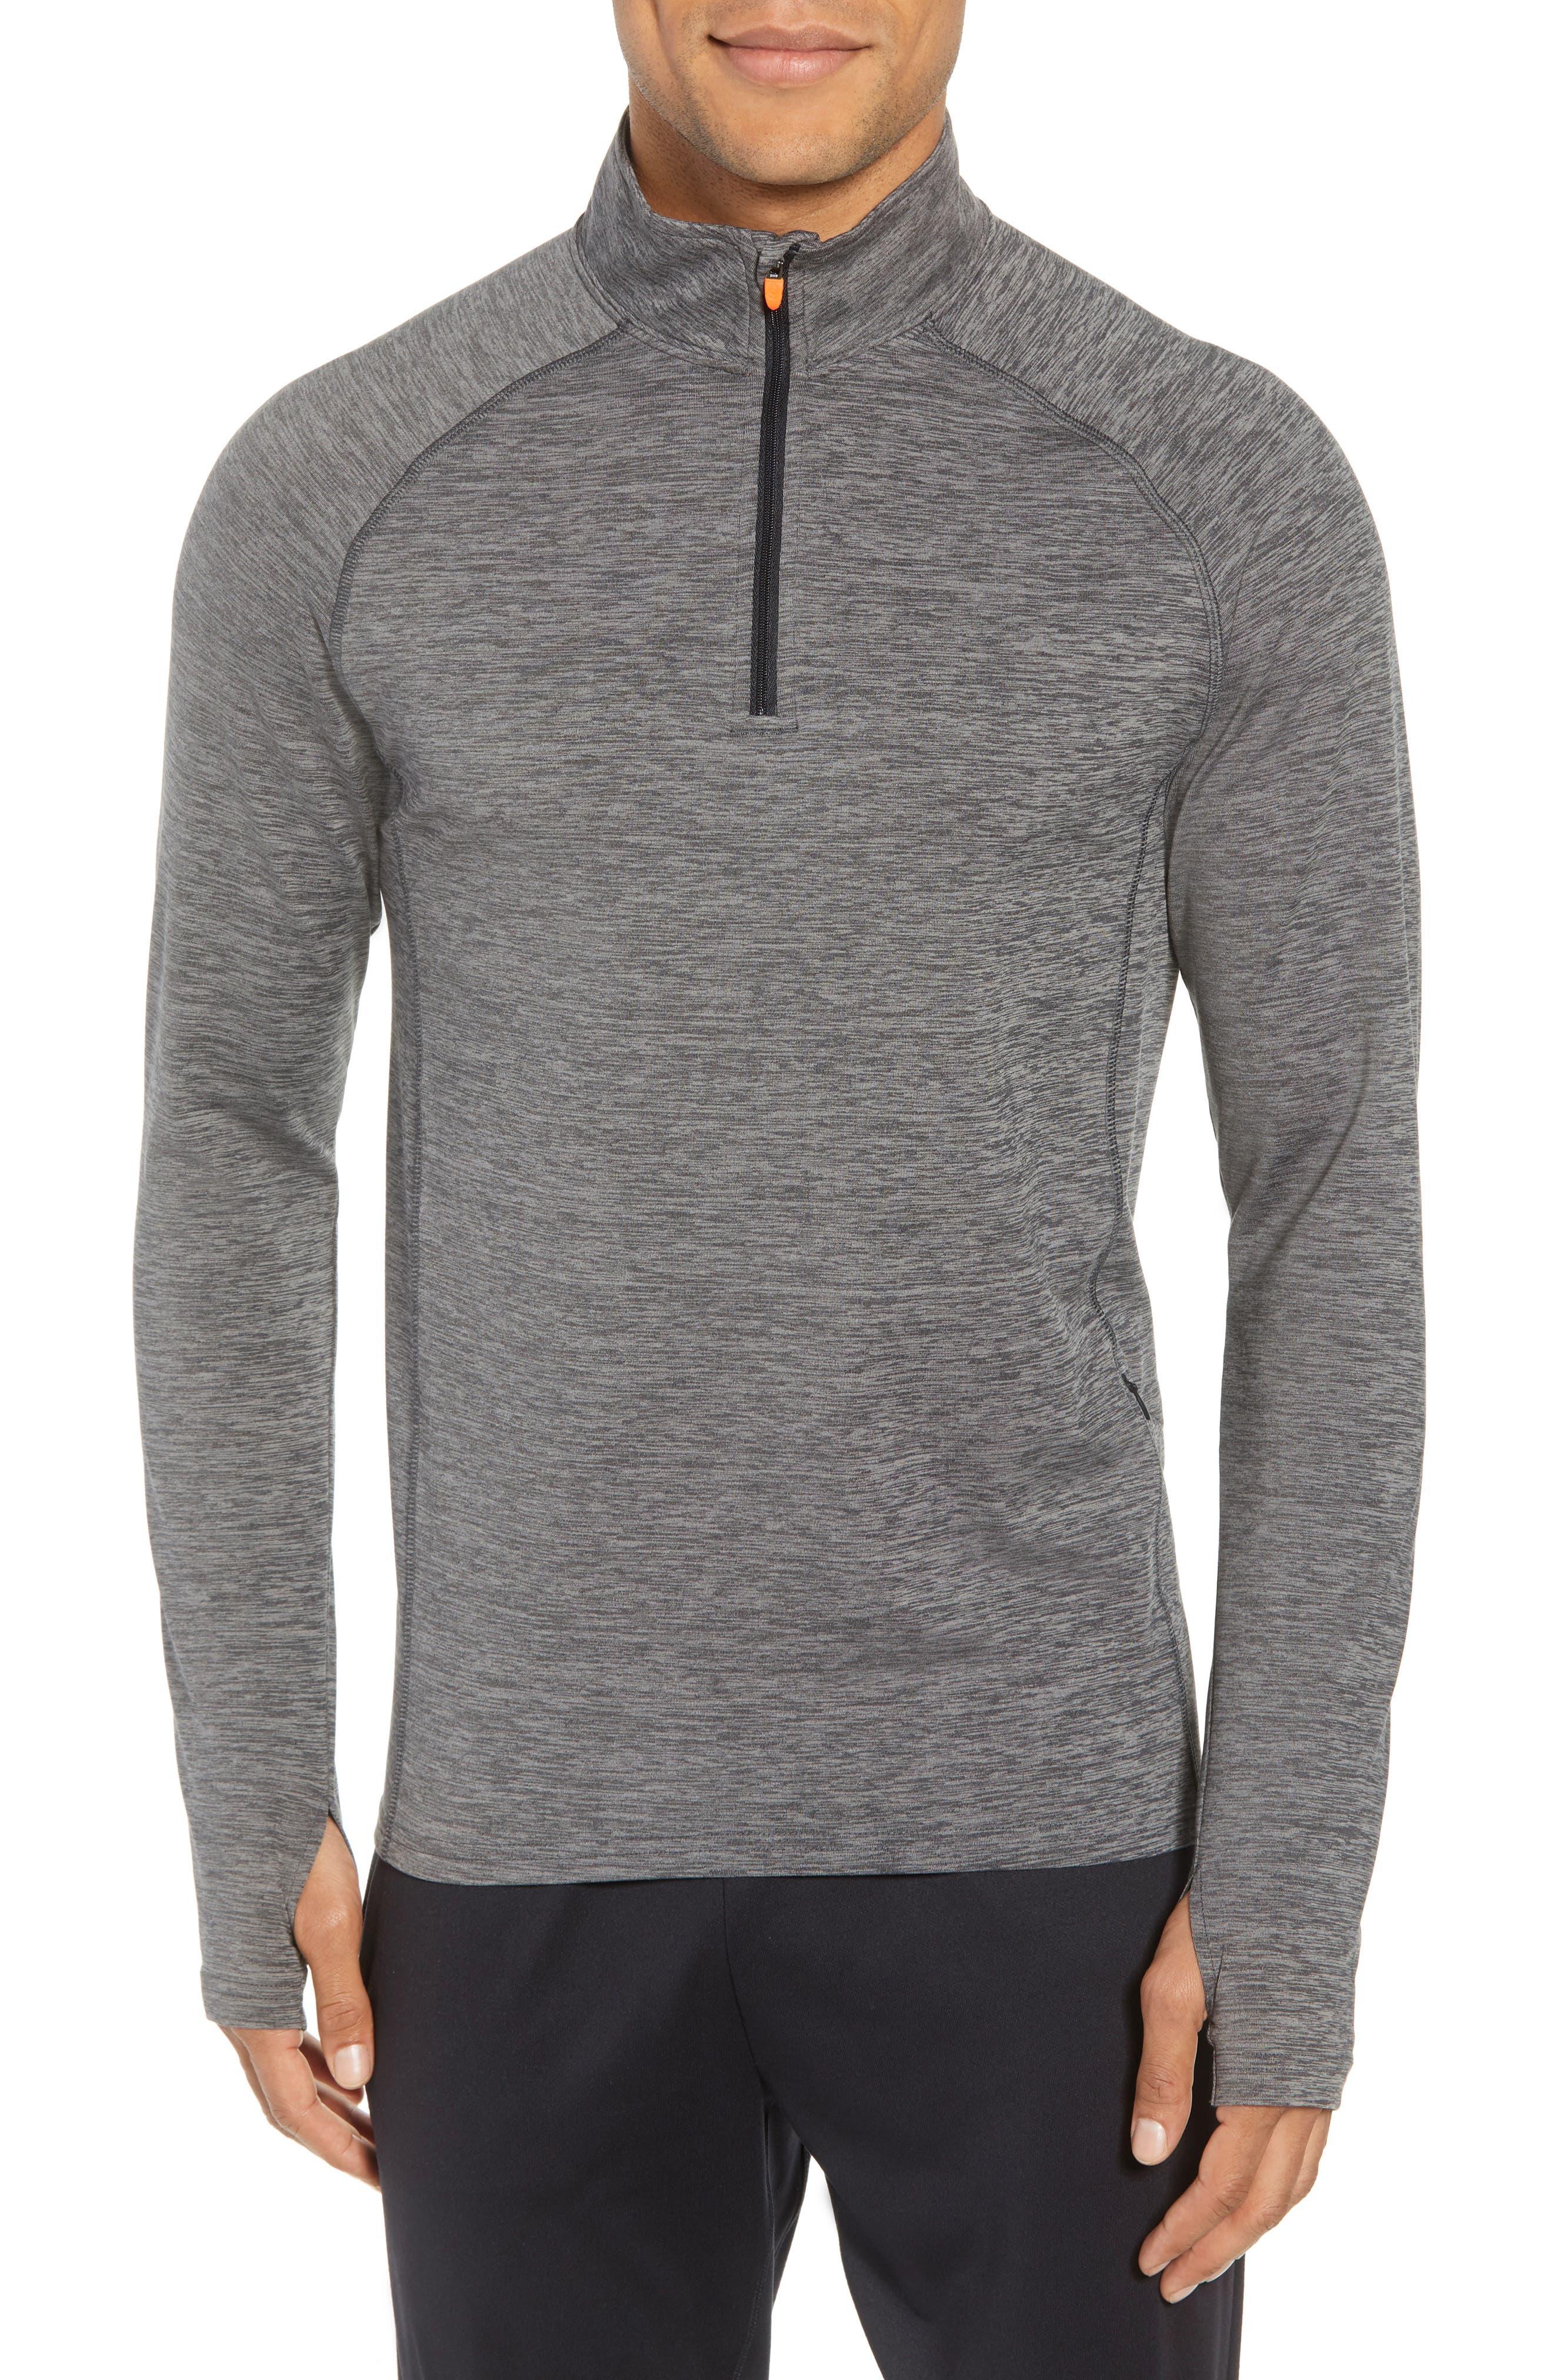 Core Half Zip Sweatshirt,                             Main thumbnail 1, color,                             001